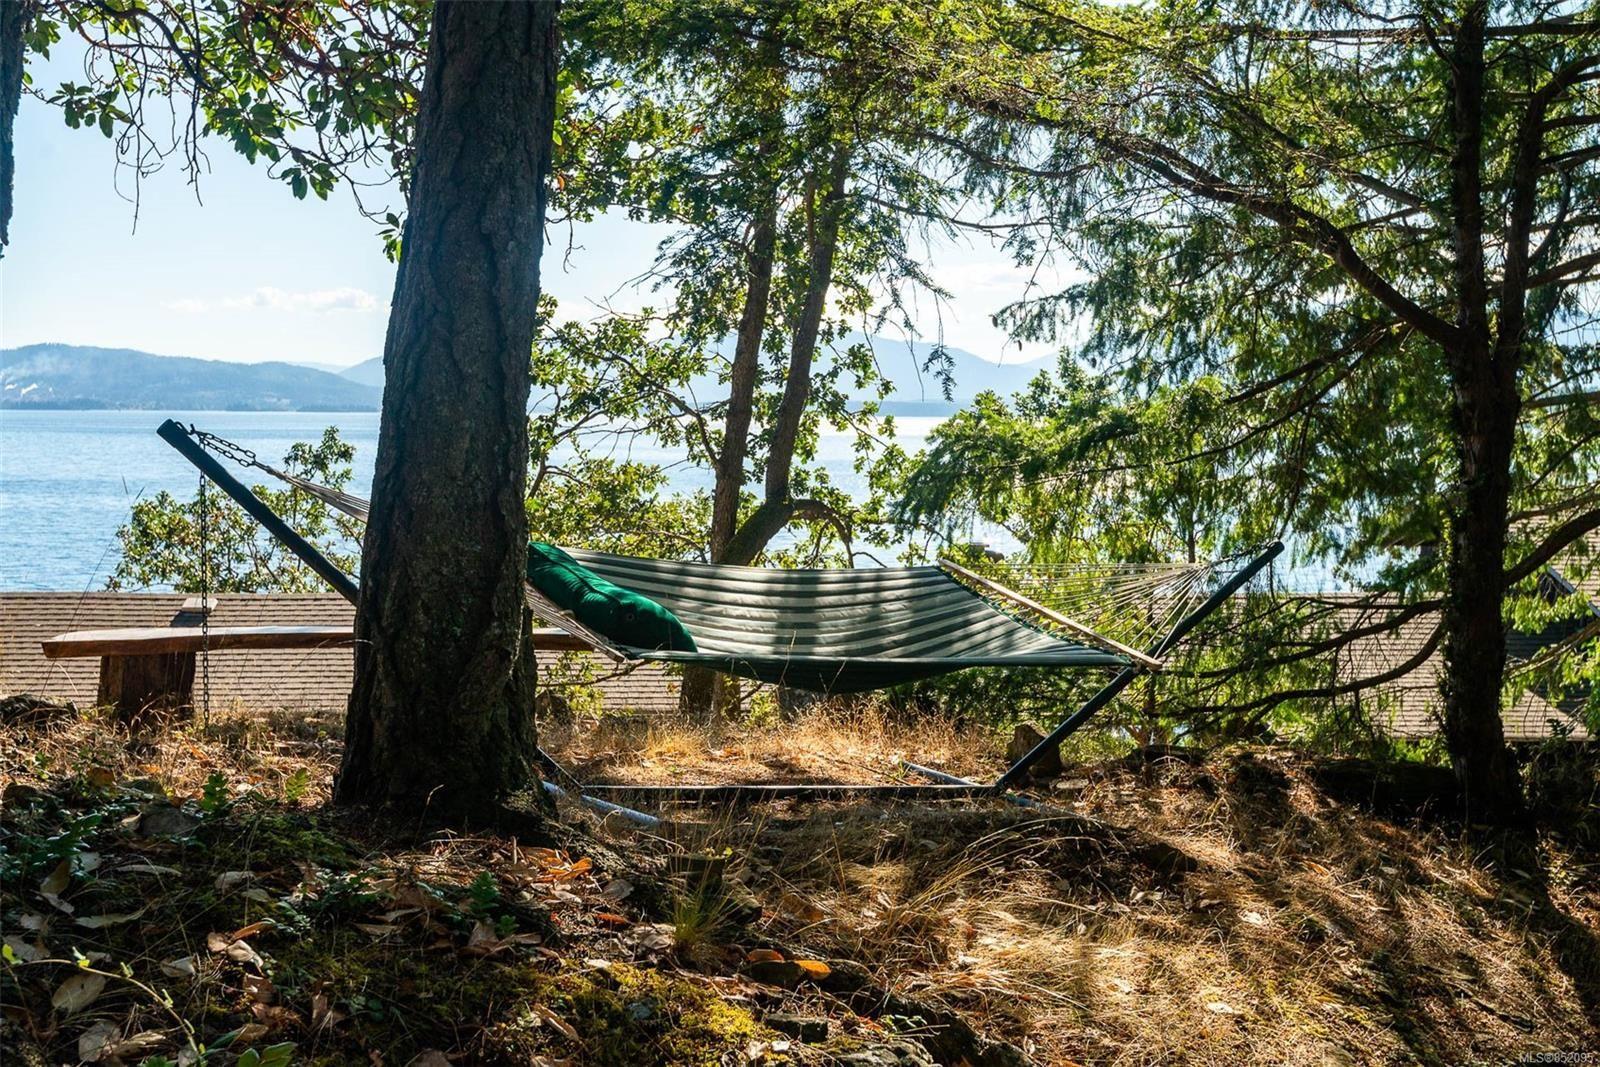 Photo 32: Photos: 236 McGill Rd in : GI Salt Spring House for sale (Gulf Islands)  : MLS®# 852095